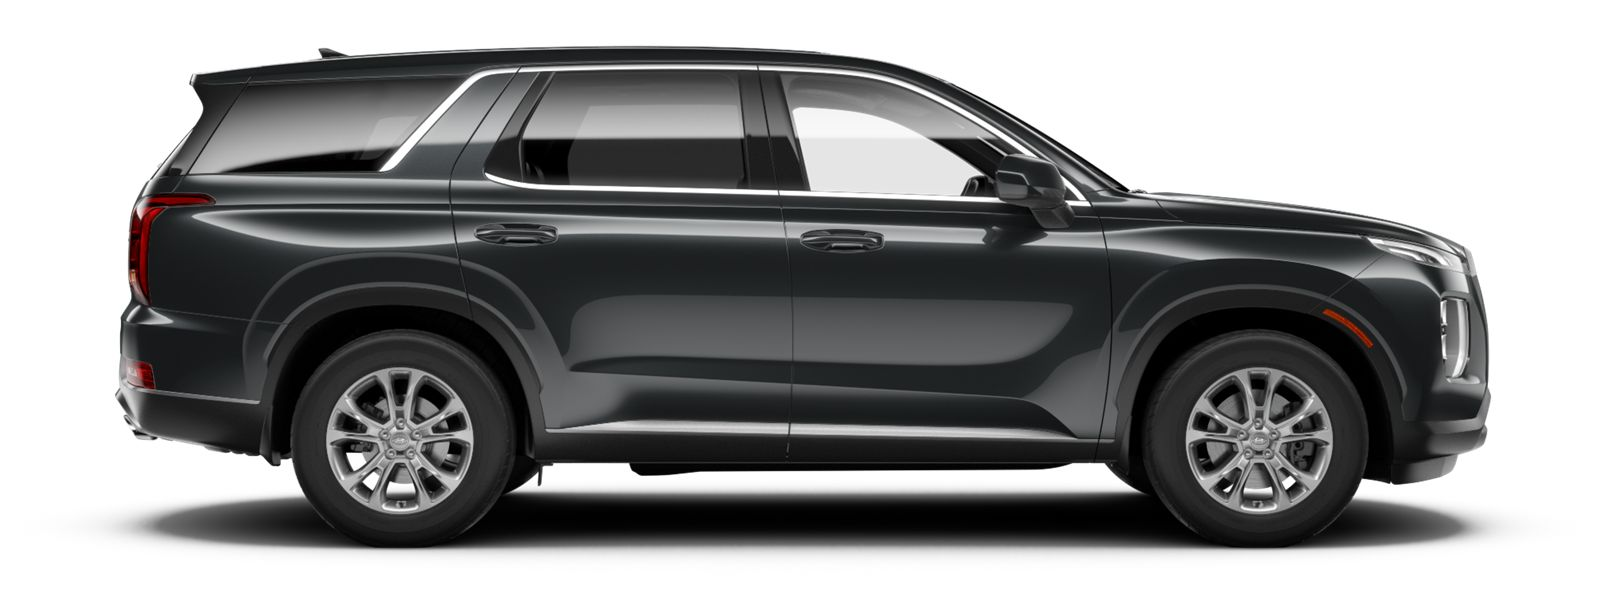 Hyundai Cars Sedans Suvs Compacts And Luxury Hyundai